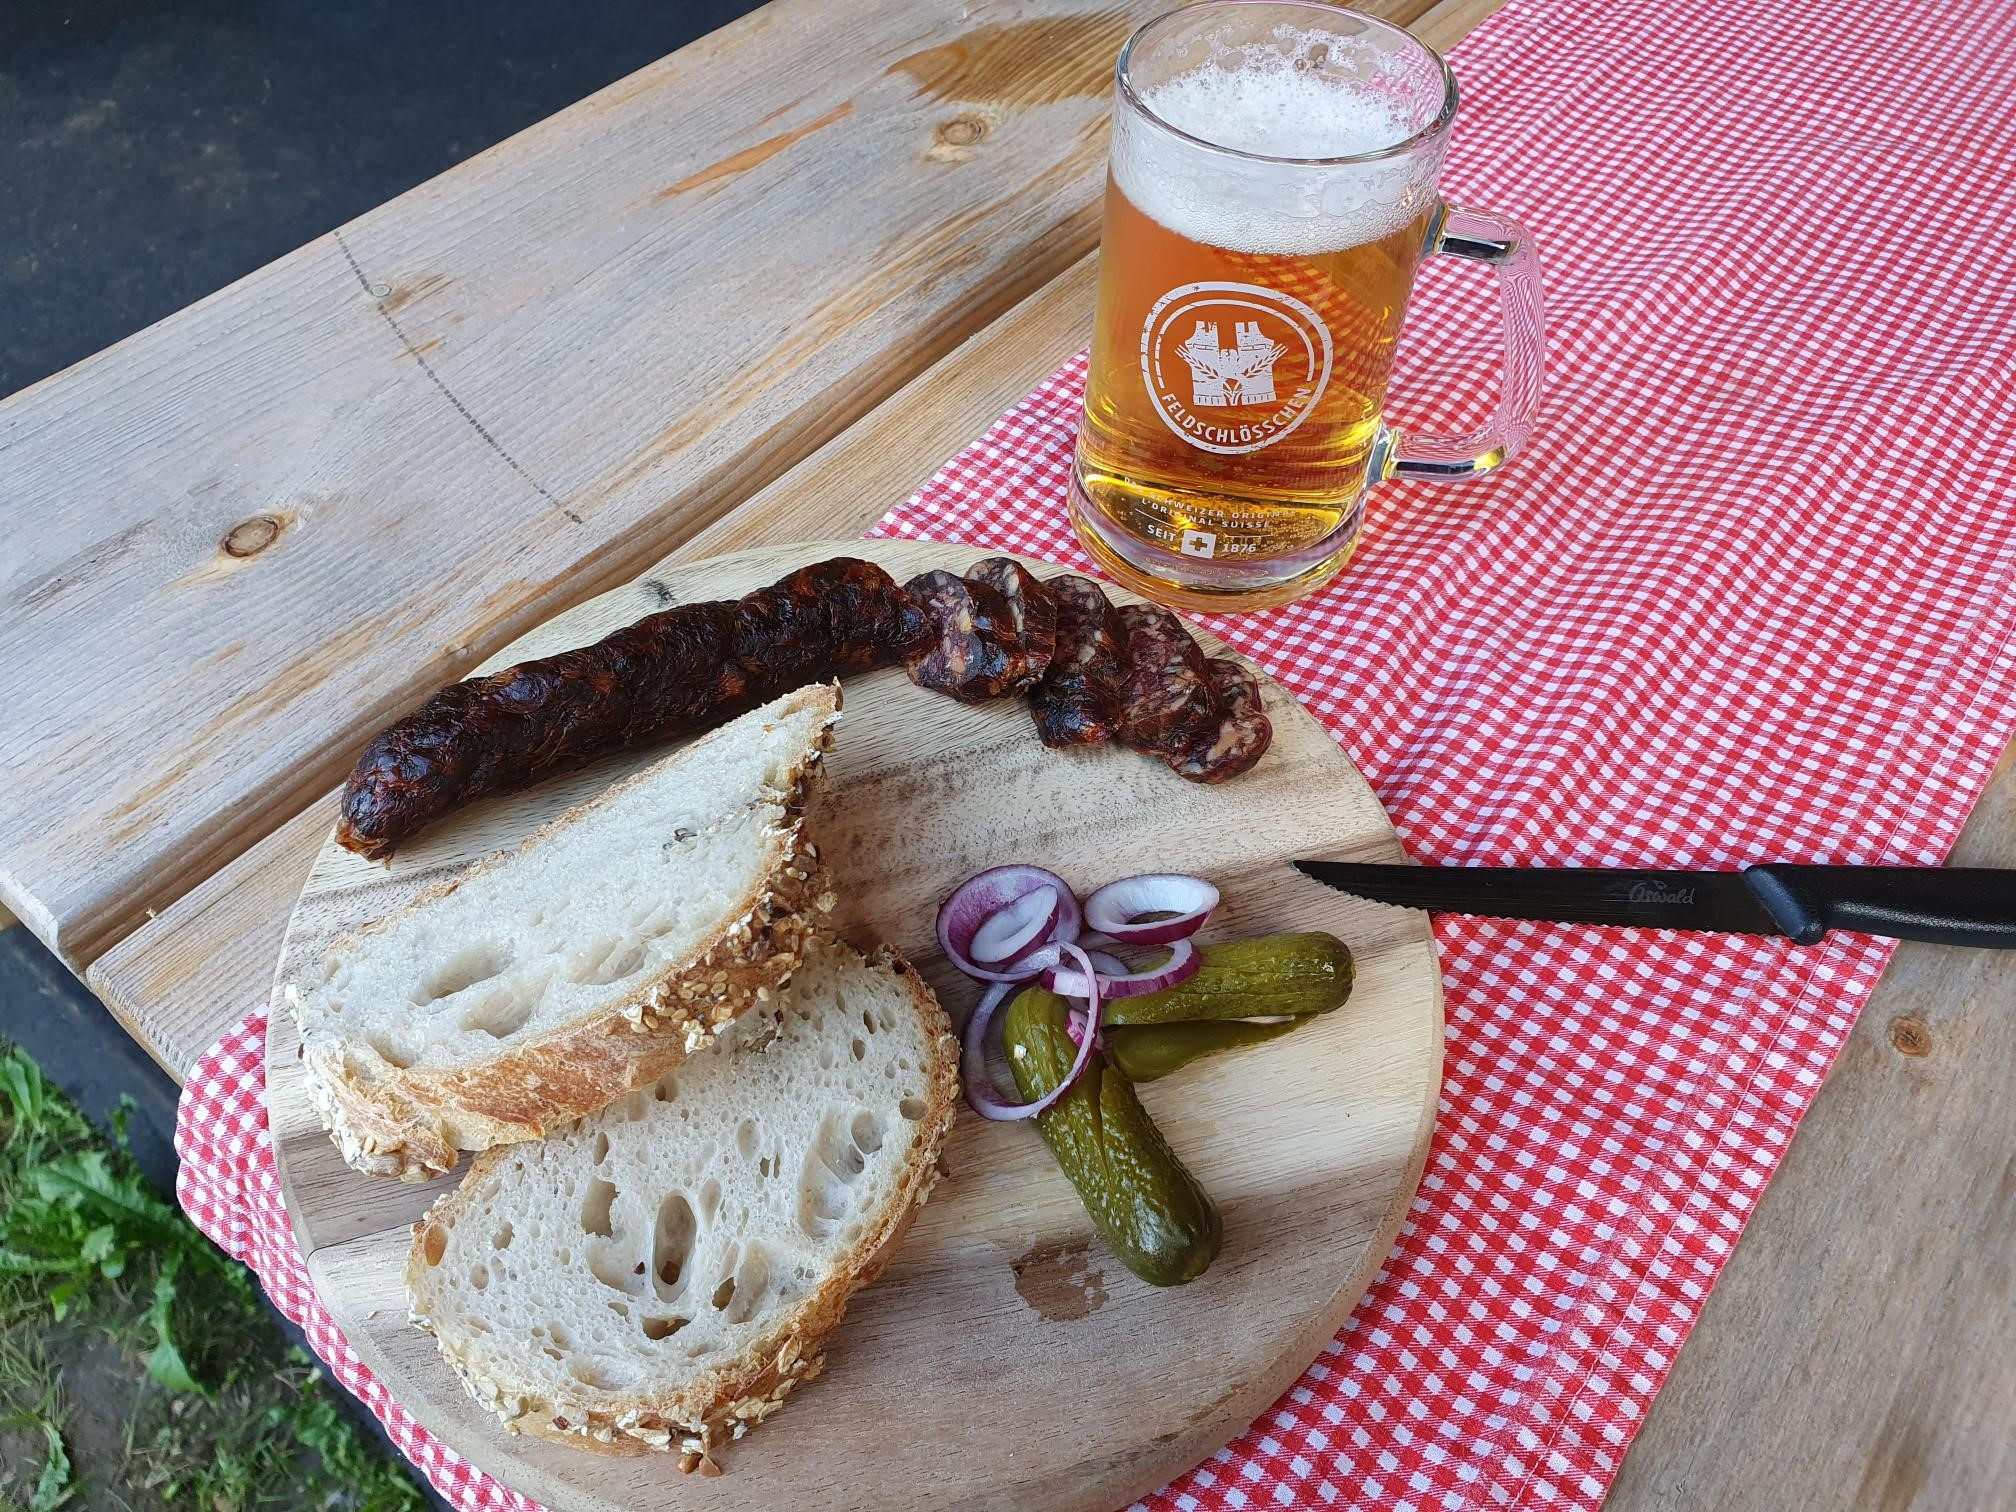 Haselhof Rauchwurst mit kl. Bier